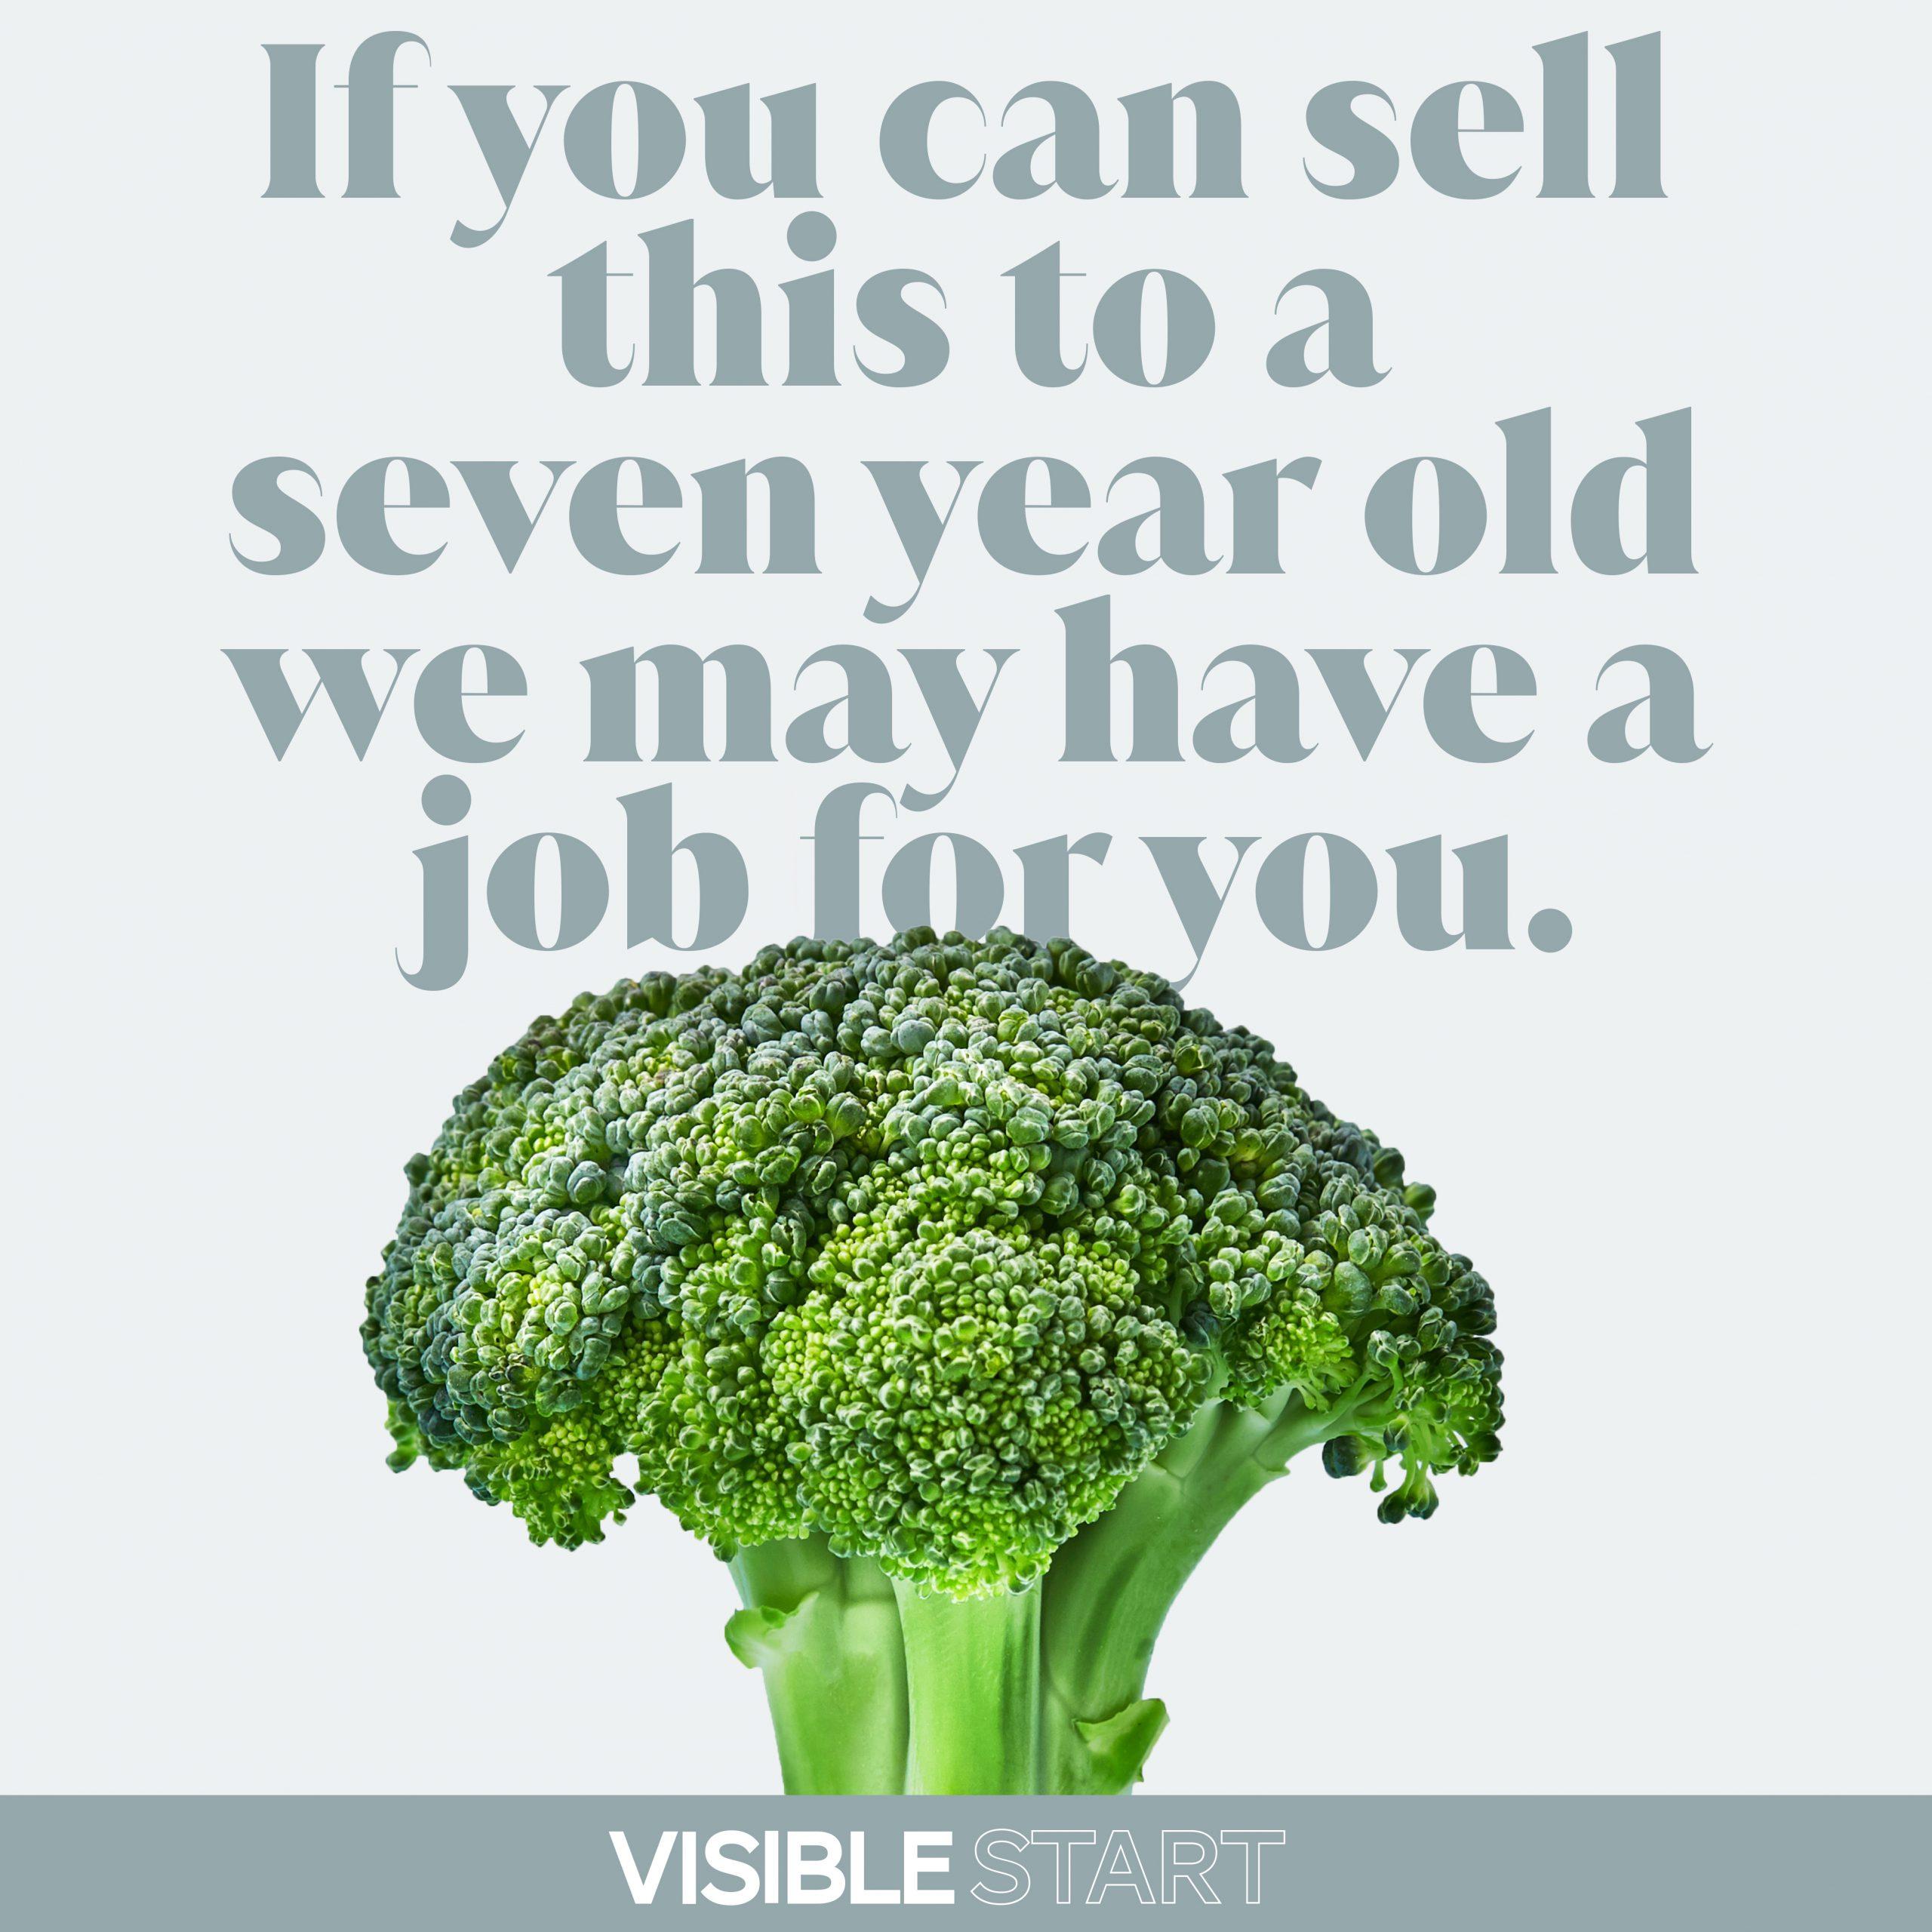 Visible Start Employment Advert